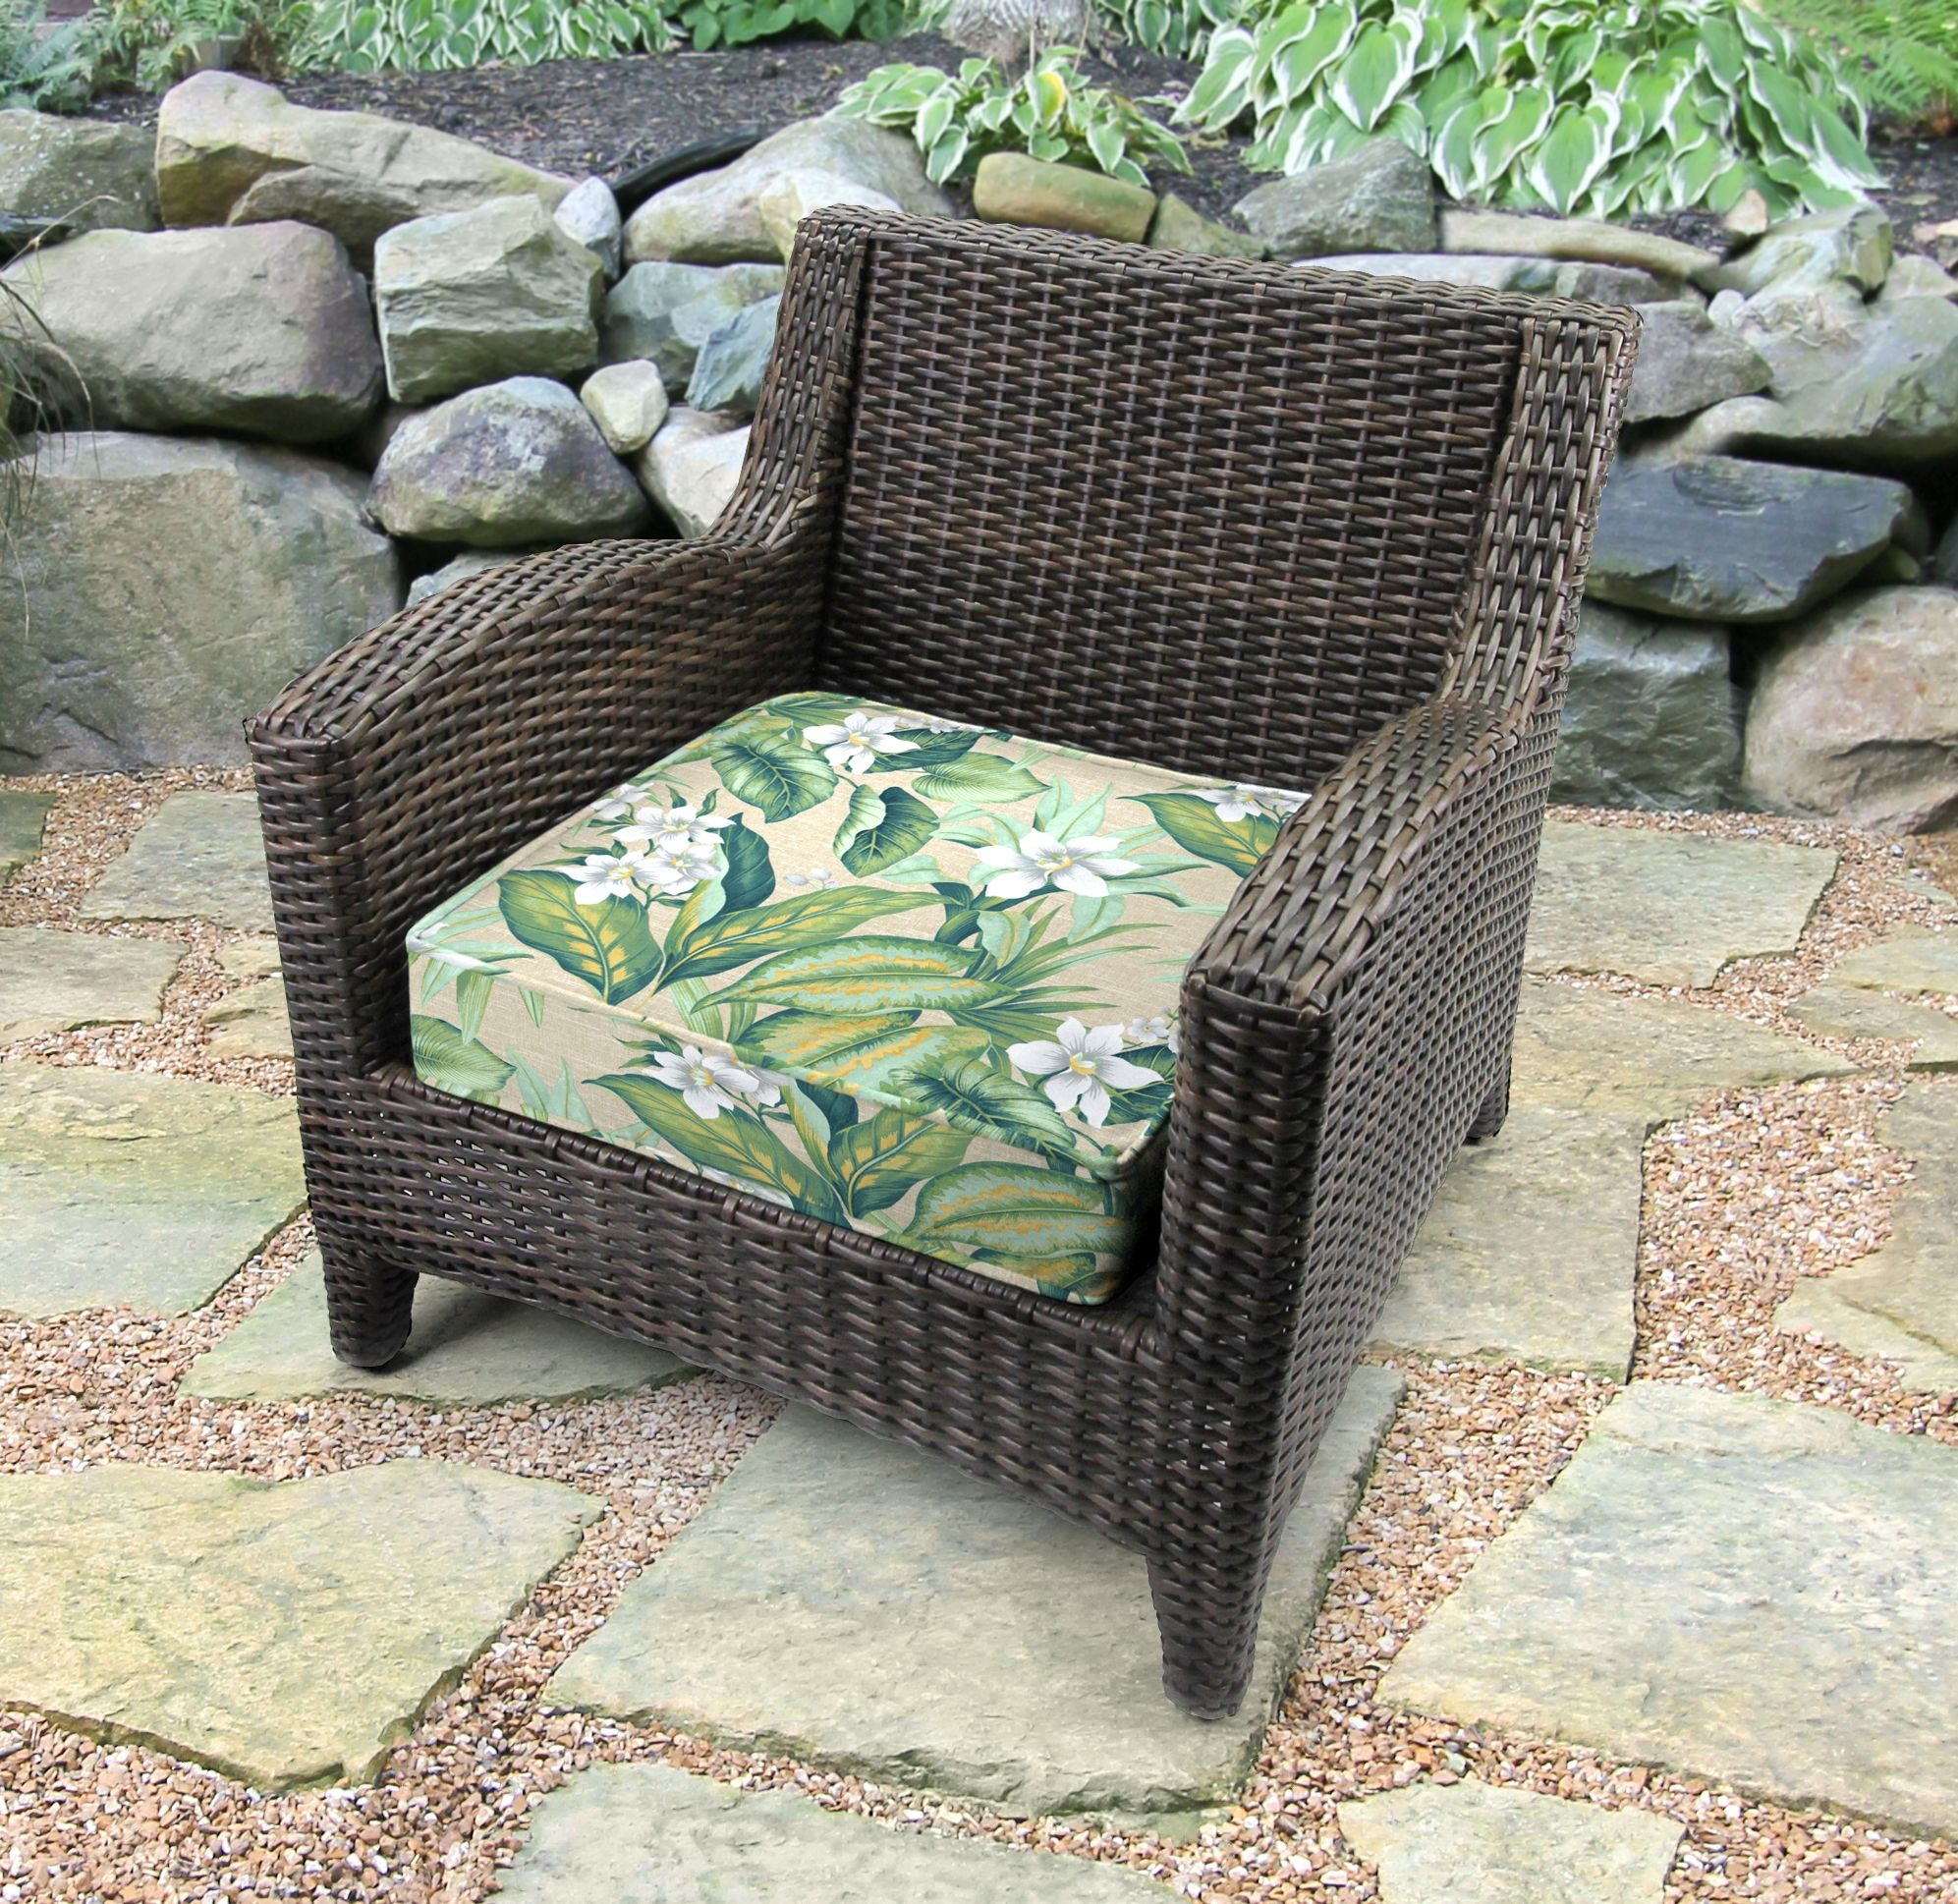 Jordan Manufacturing Outdoor Boxed Edge Deep Seat Cushion Tahiti Breeze In 2021 Deep Seat Cushions Outdoor Deep Seat Cushions Jordan Manufacturing